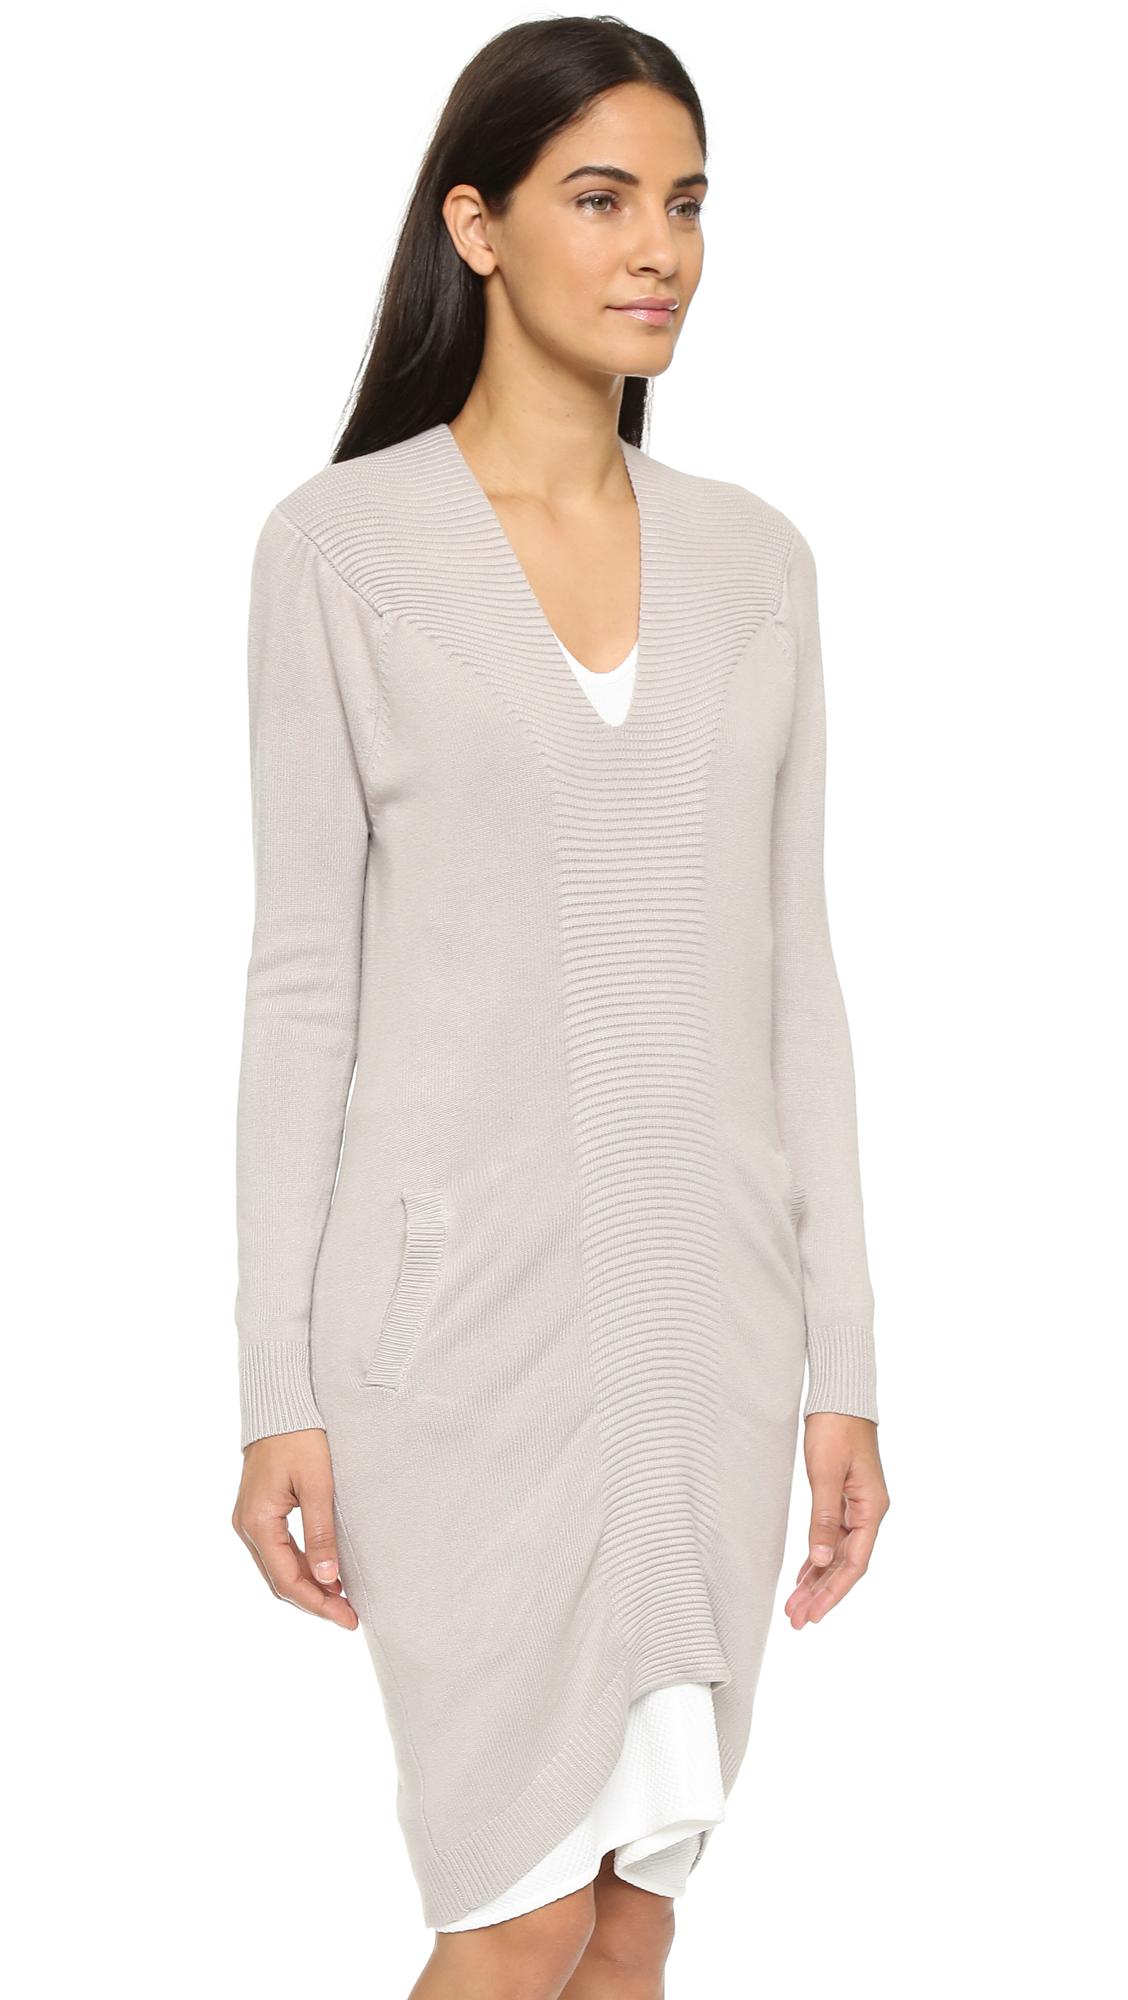 Lyst - Zero + Maria Cornejo Quinn Sweater Dress